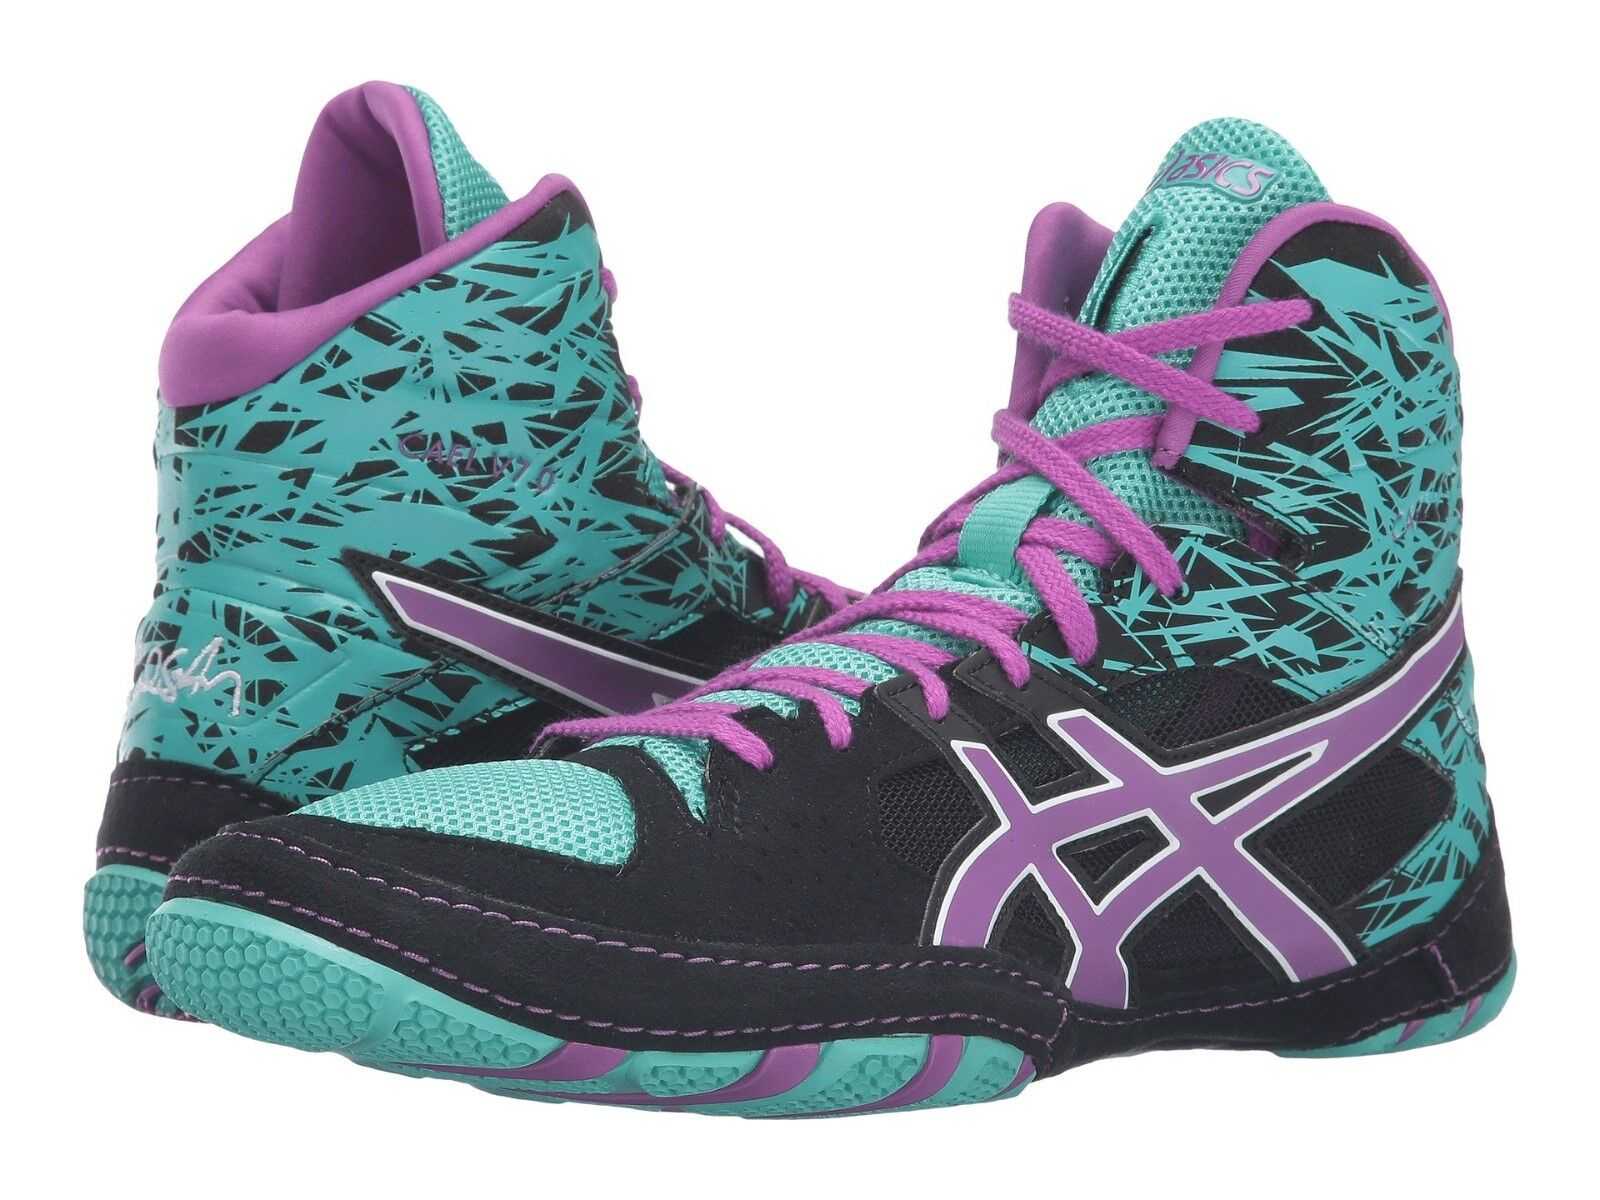 NEW Schuhe ASICS CAEL v7.0 WRESTLING Schuhe NEW - 10/ EURO 42.5 -KICKBOXING/MARTIAL ARTS/MMA 0a879e